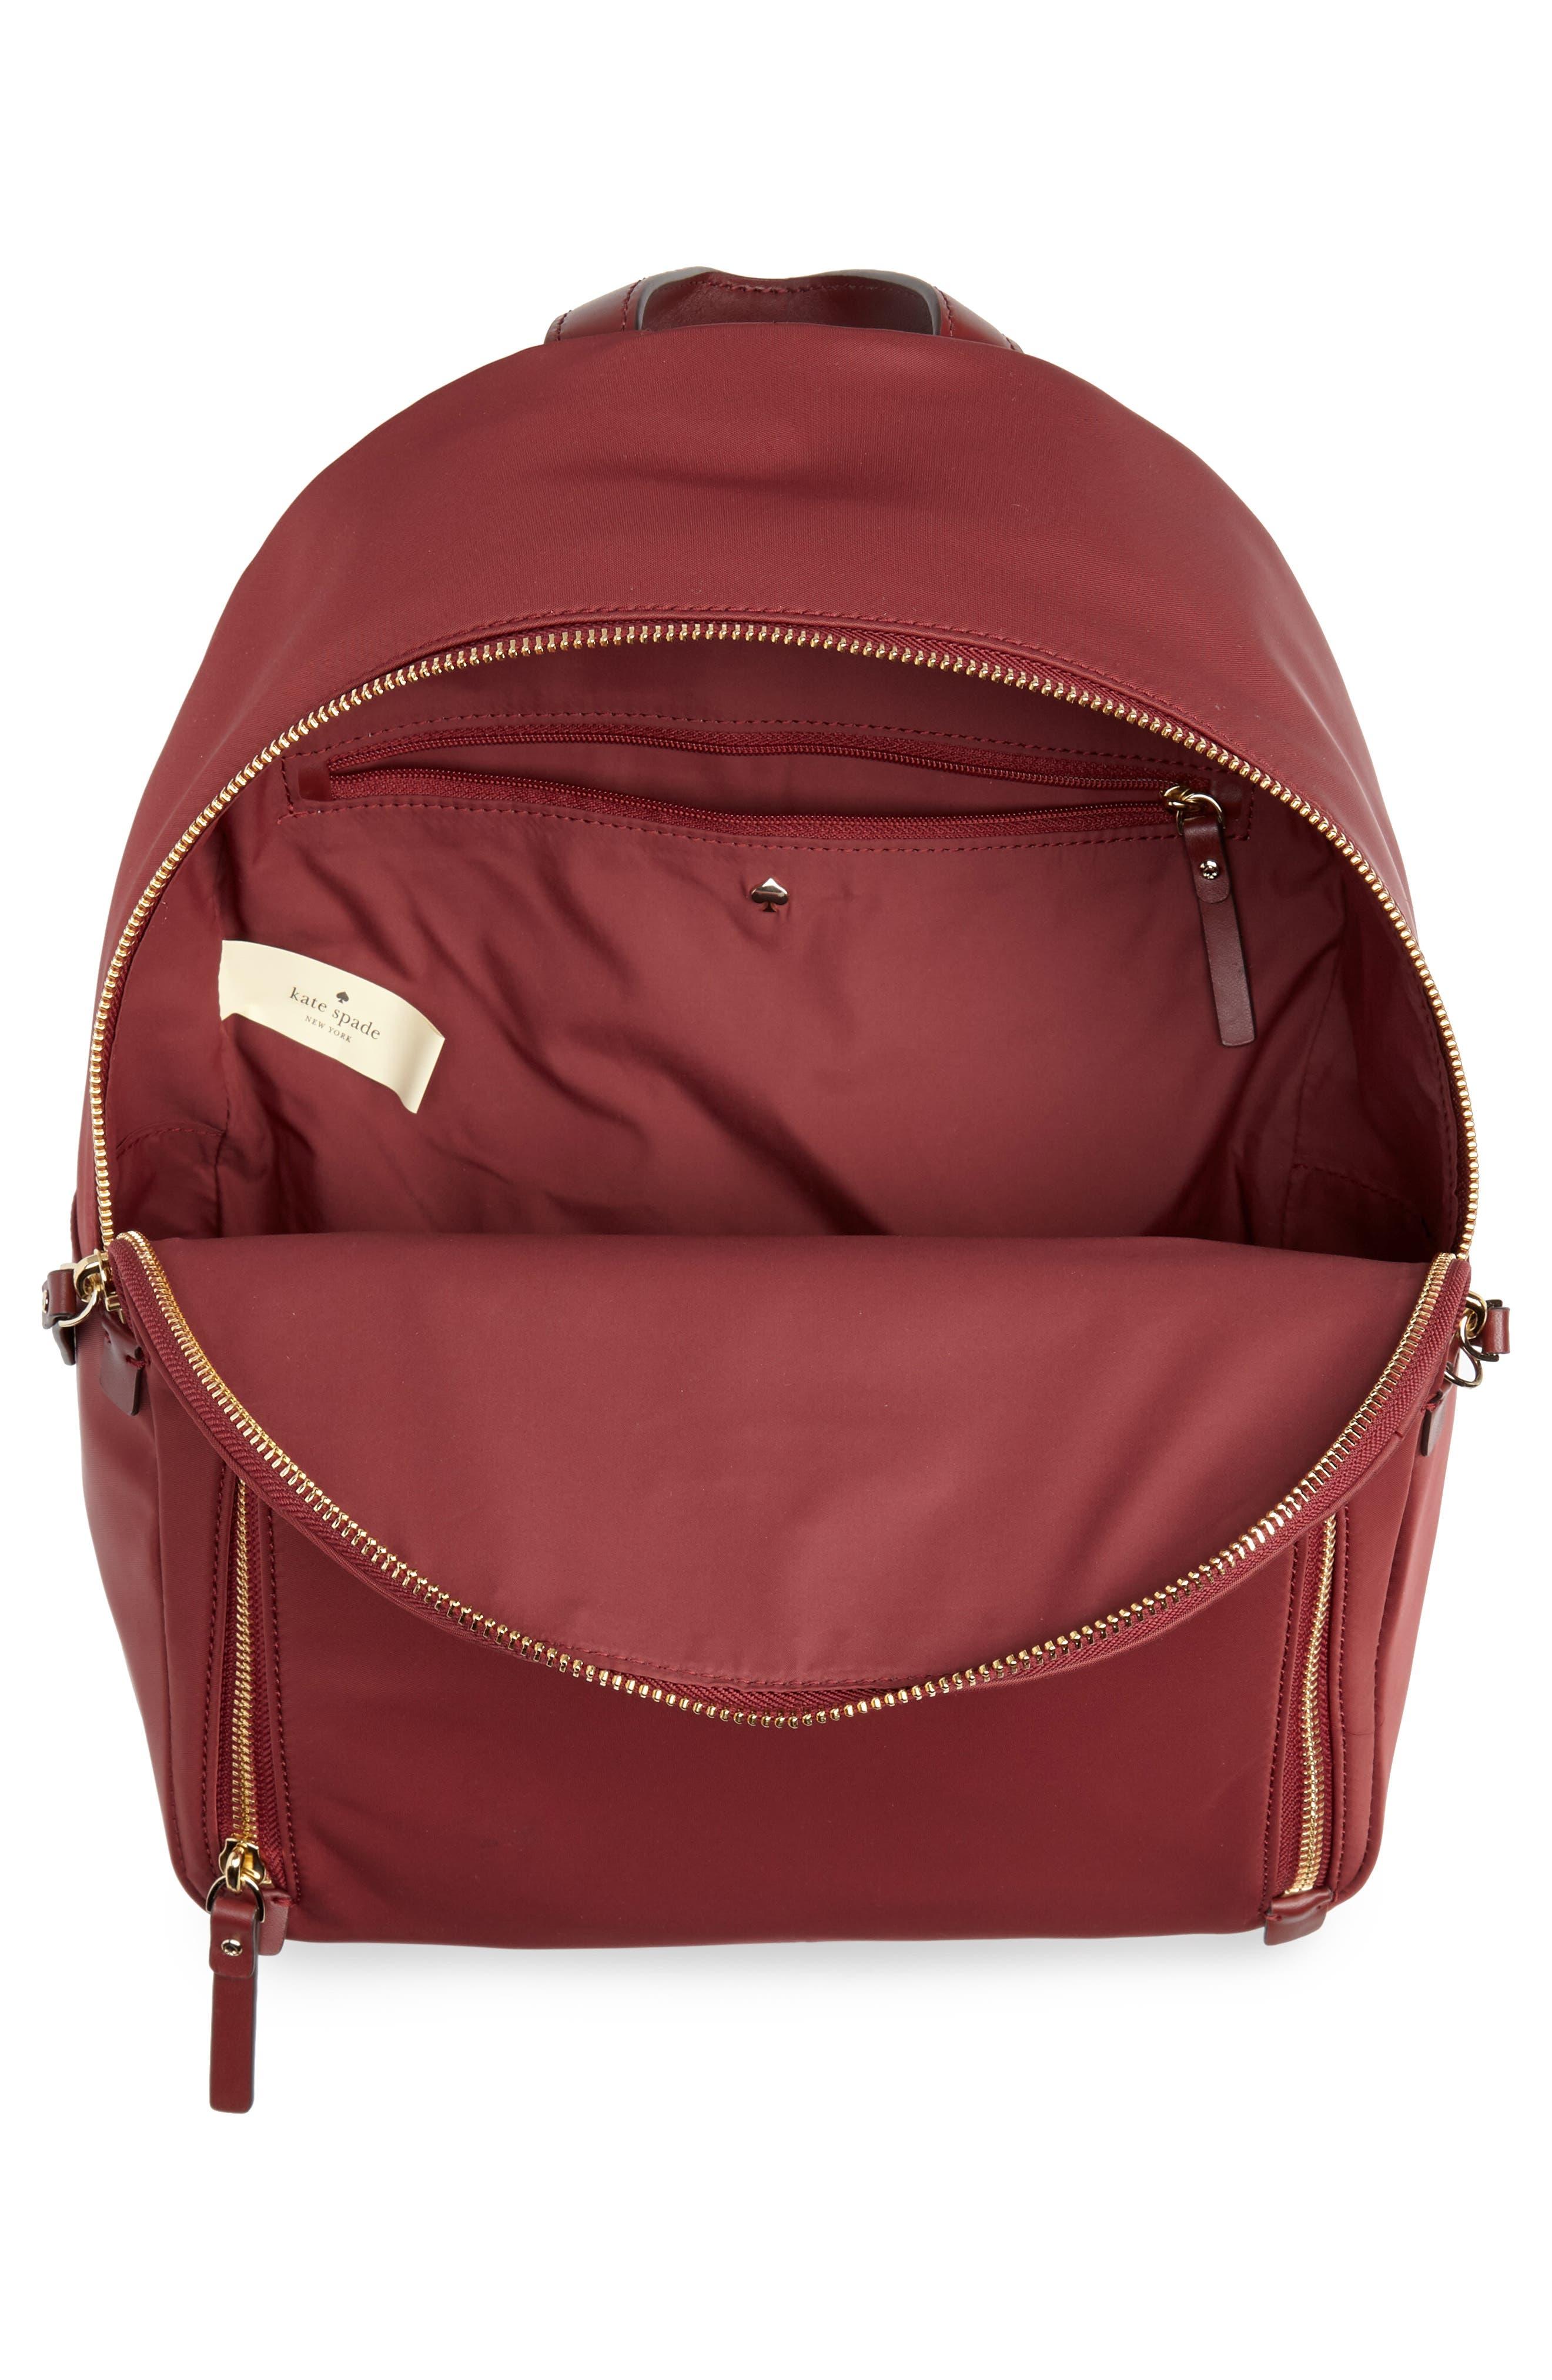 watson lane - hartley nylon backpack,                             Alternate thumbnail 4, color,                             DARK CURRANT